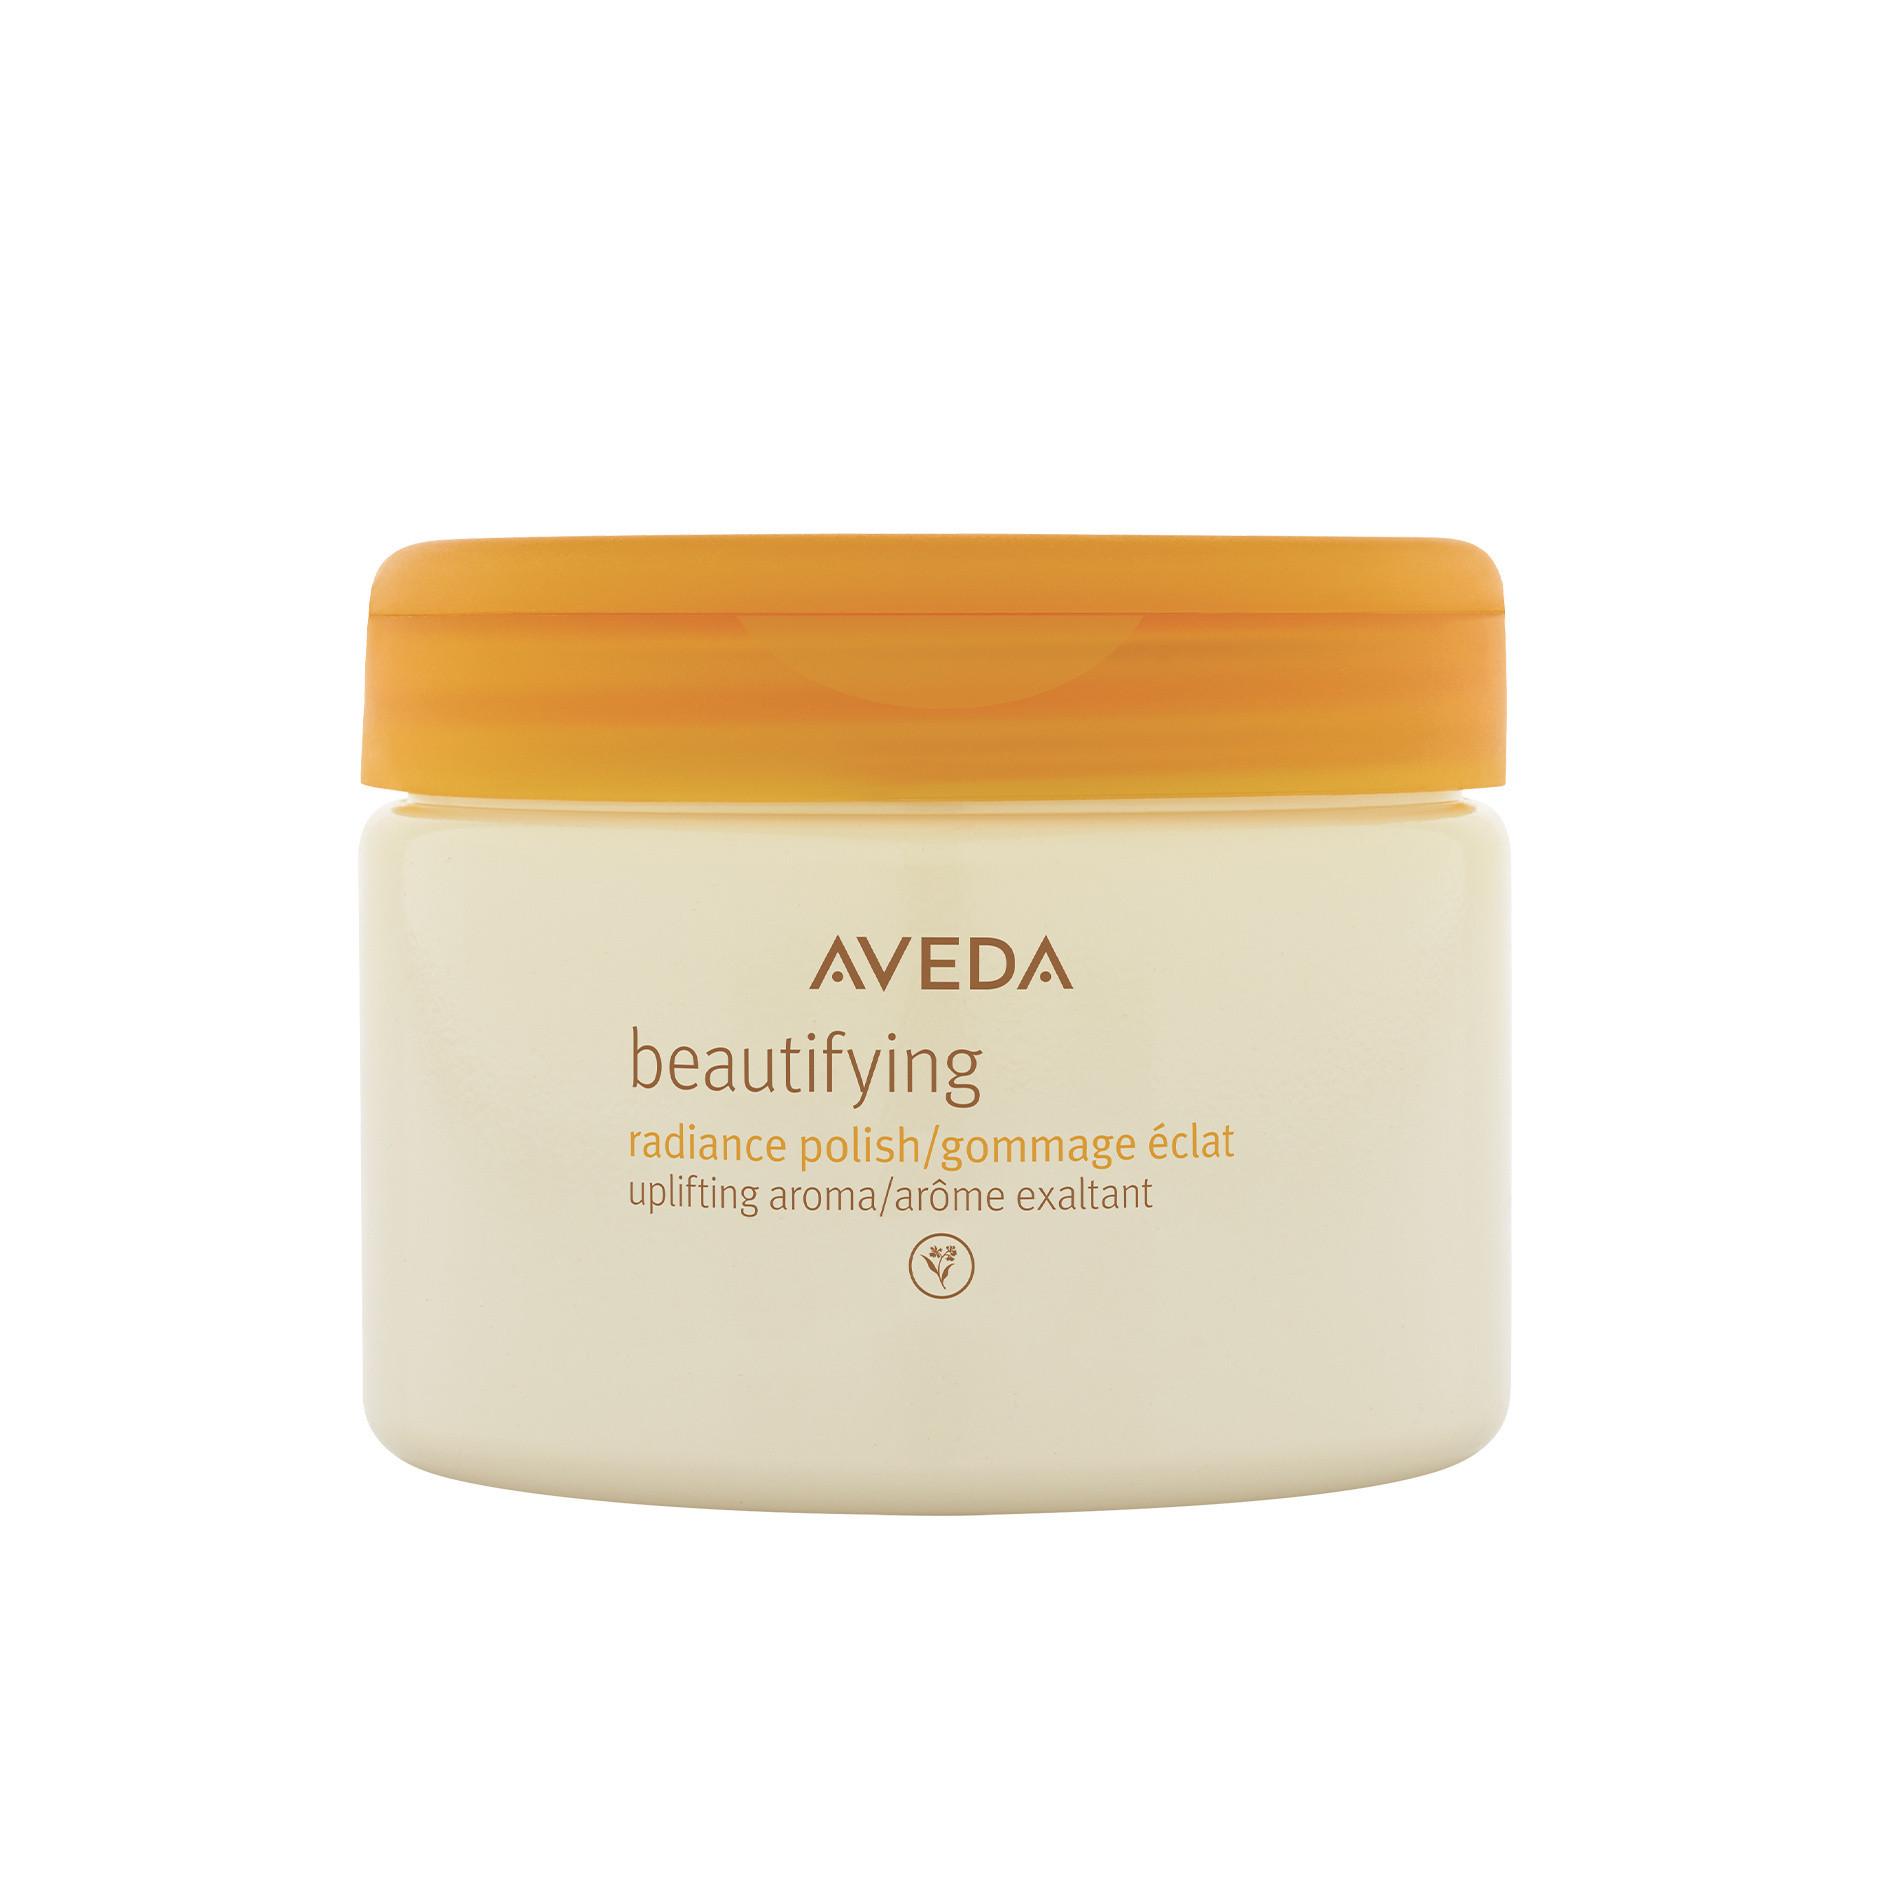 Aveda beautifying scrub corpo 400 ml, Beige, large image number 0